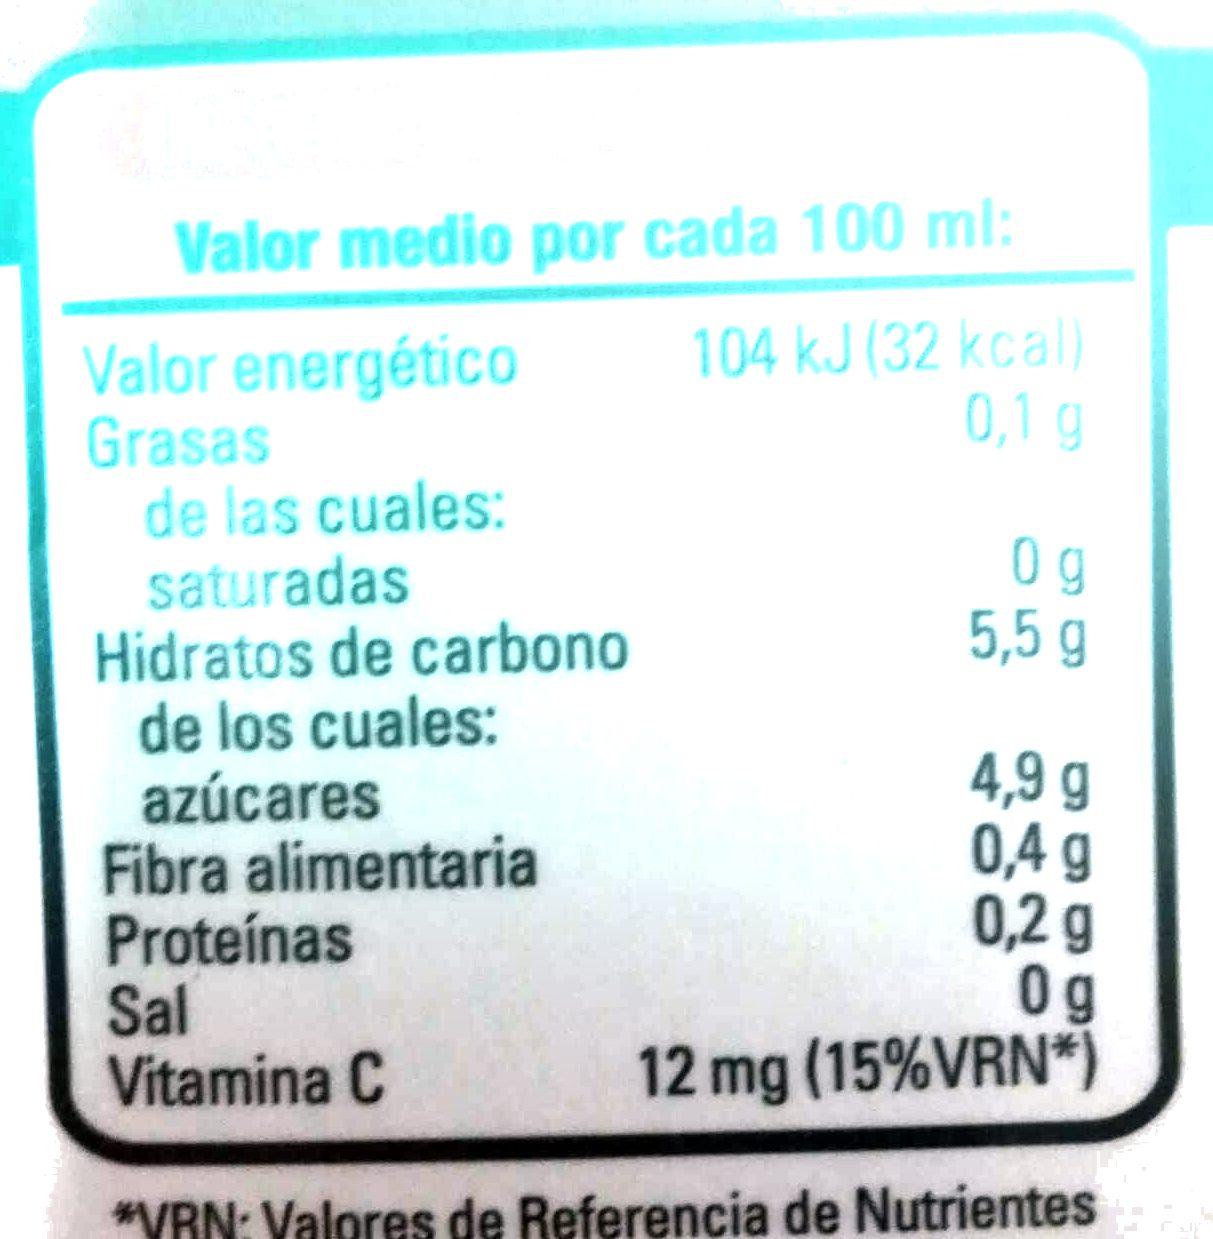 Anti oxidante - Informació nutricional